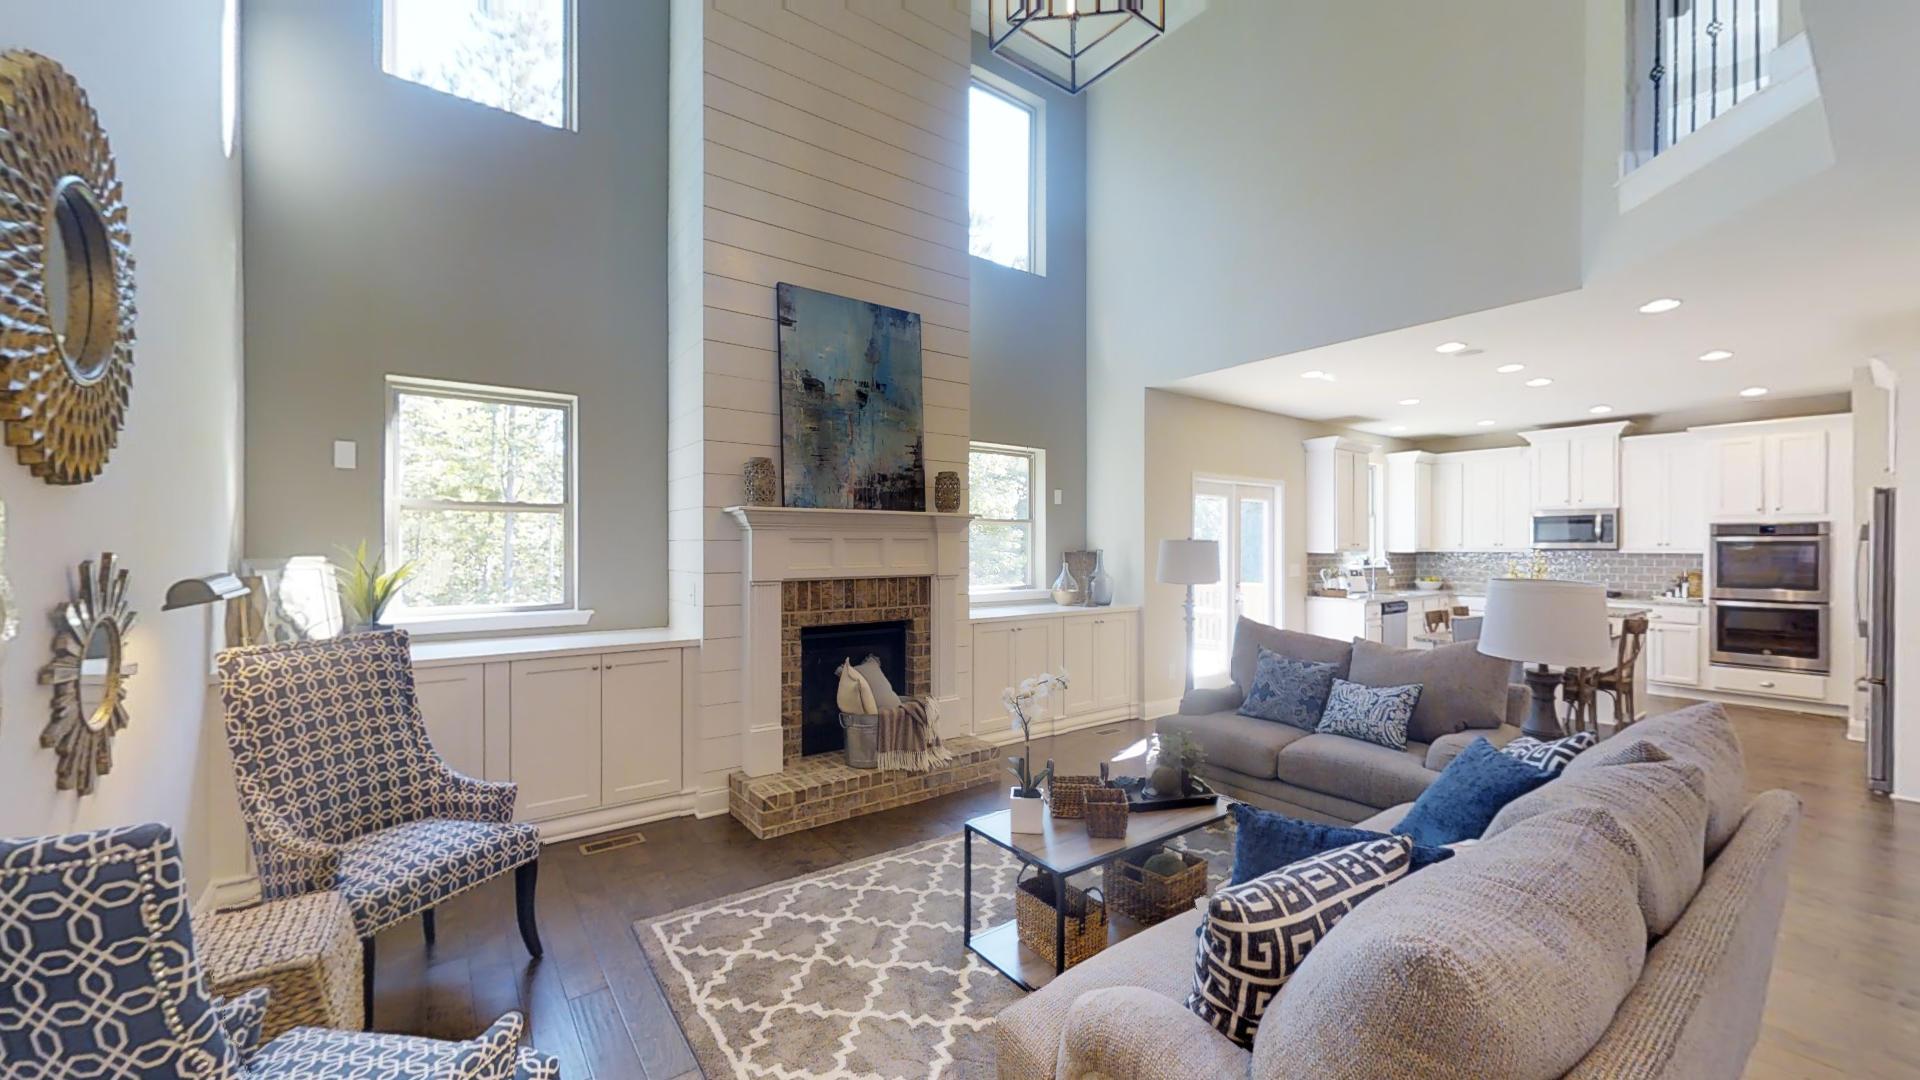 SR Homes: The Millcreek Plan at Concord Creek